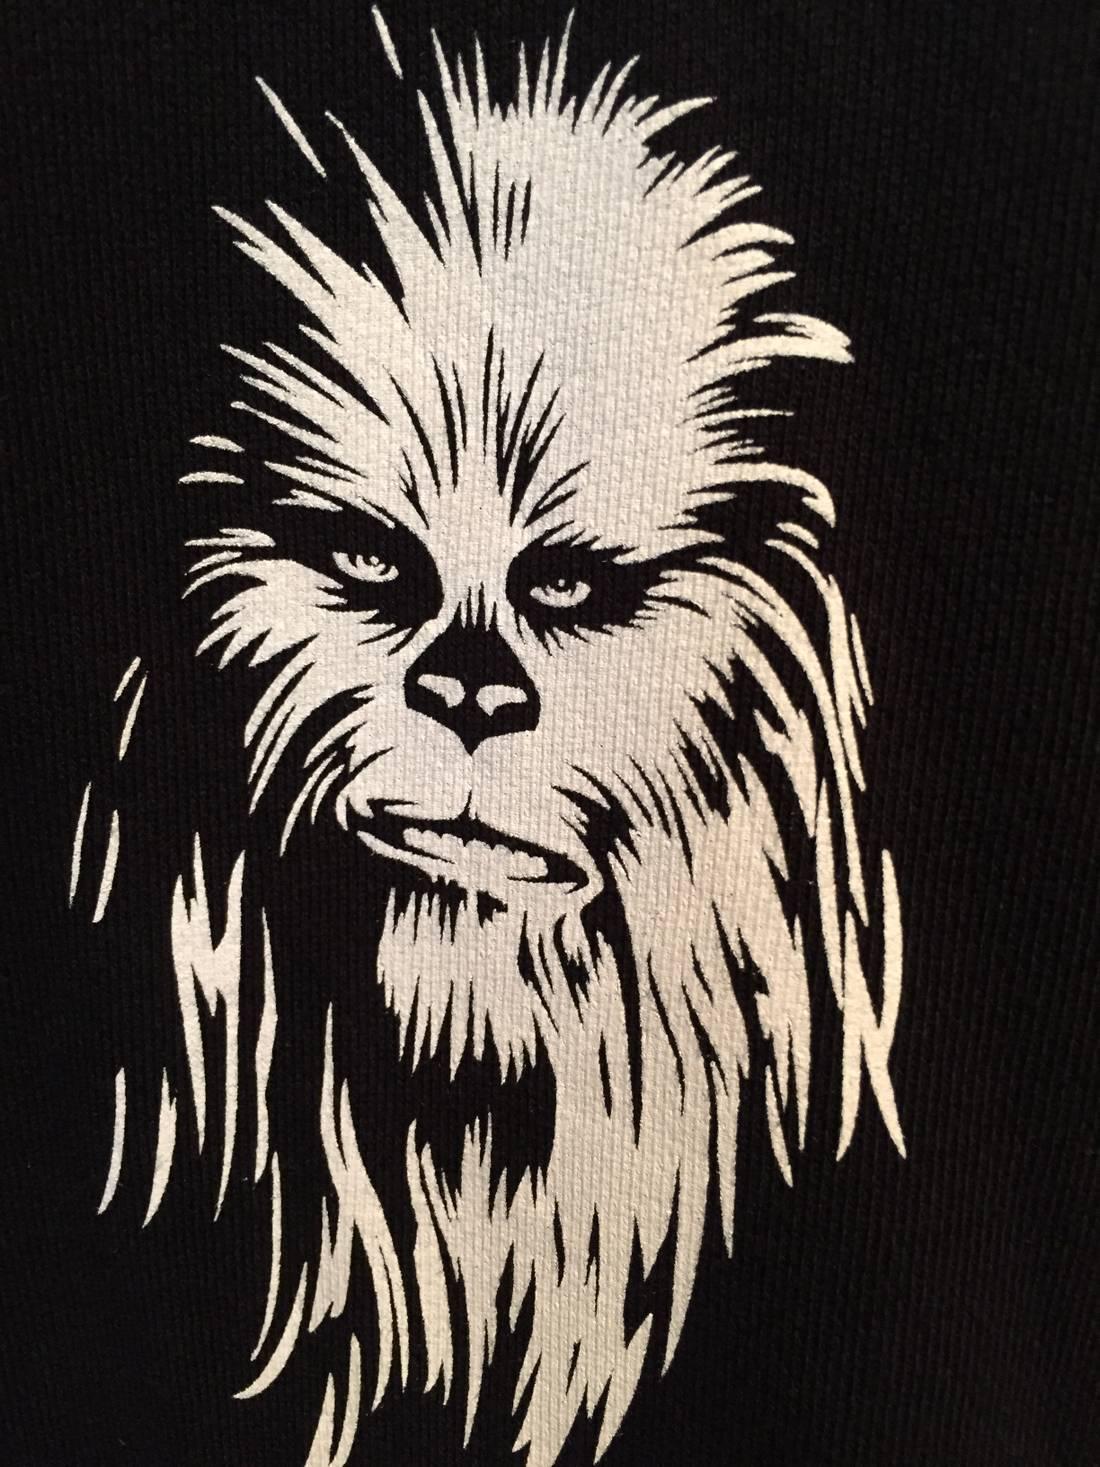 Uniqlo Star Wars Chewbacca Hoodie Size L Sweatshirts Hoodies - Hoodie will turn you into chewbacca from star wars